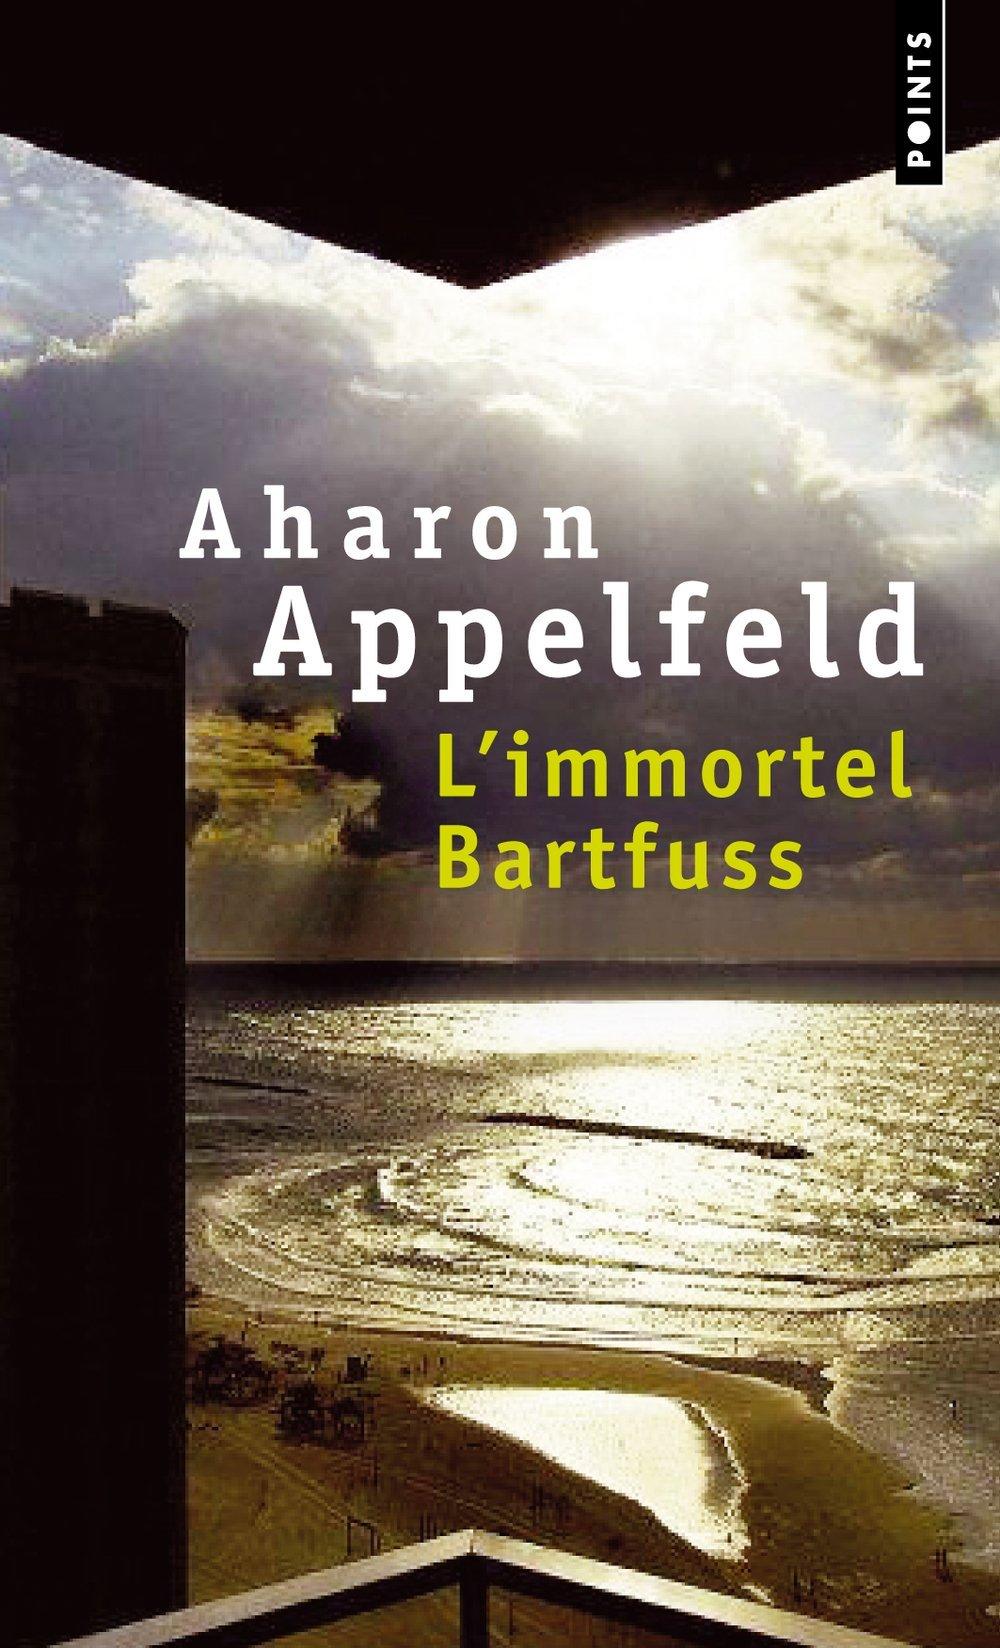 L'immortel Bartfuss - Aharon Appelfeld